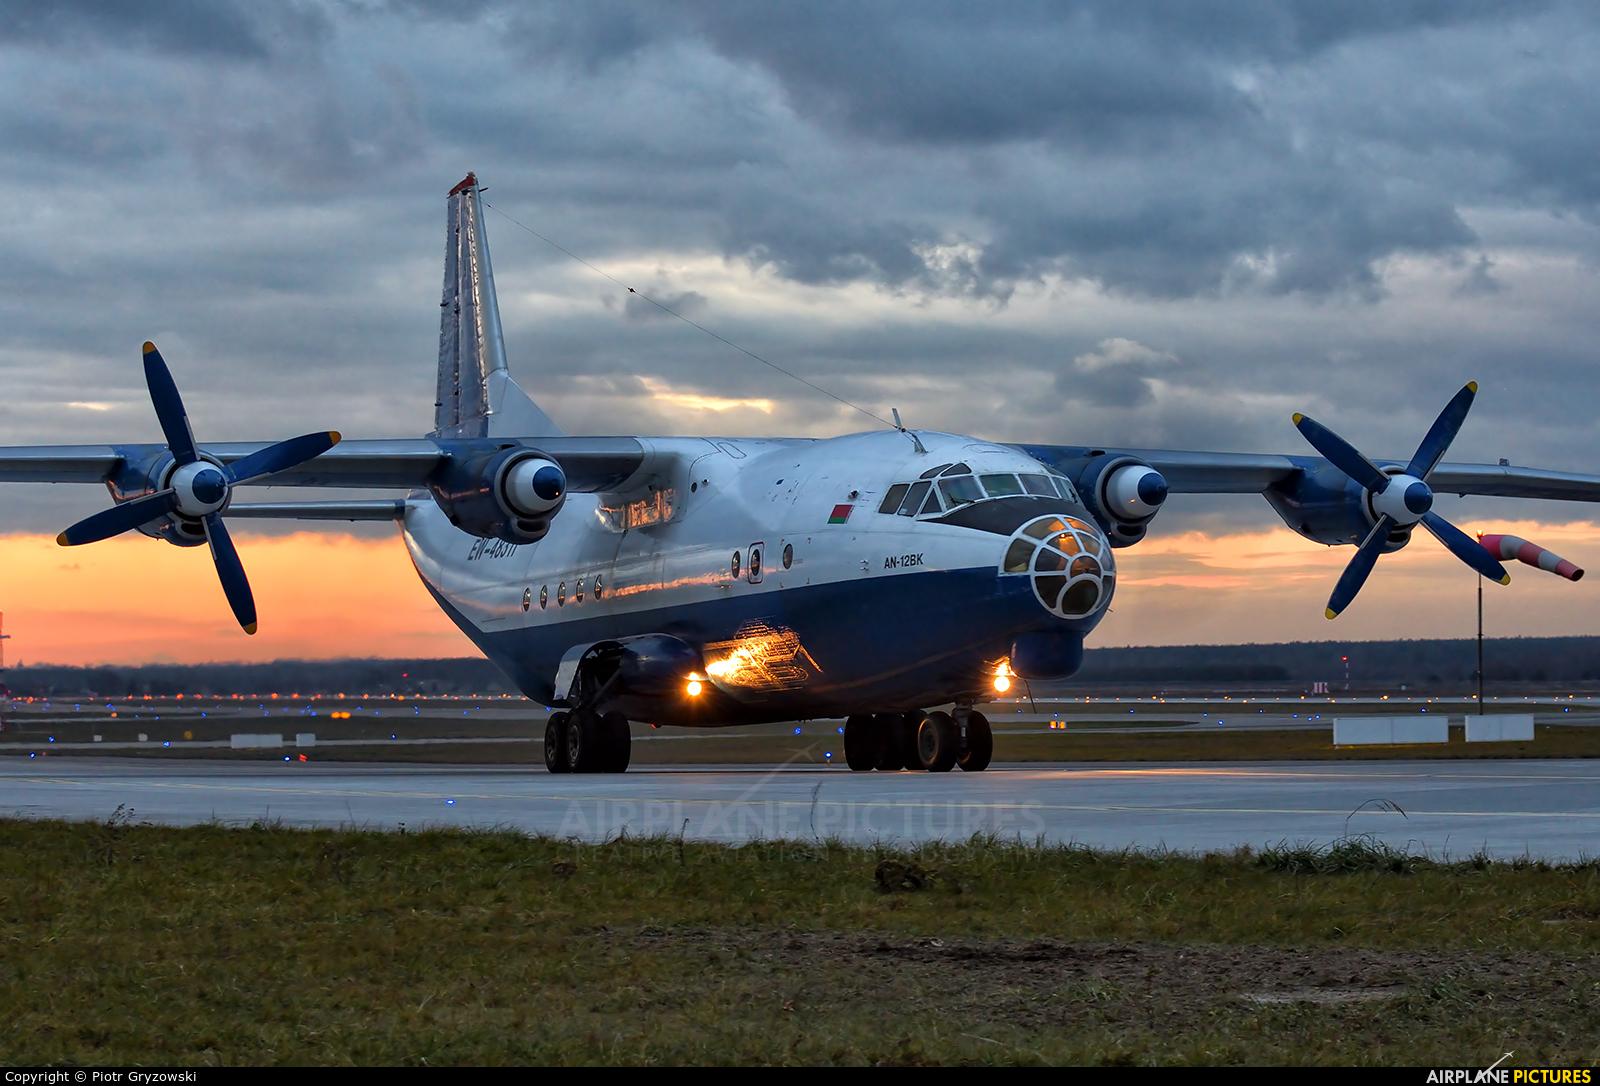 Ruby Star Air Enterprise EW-483TI aircraft at Katowice - Pyrzowice